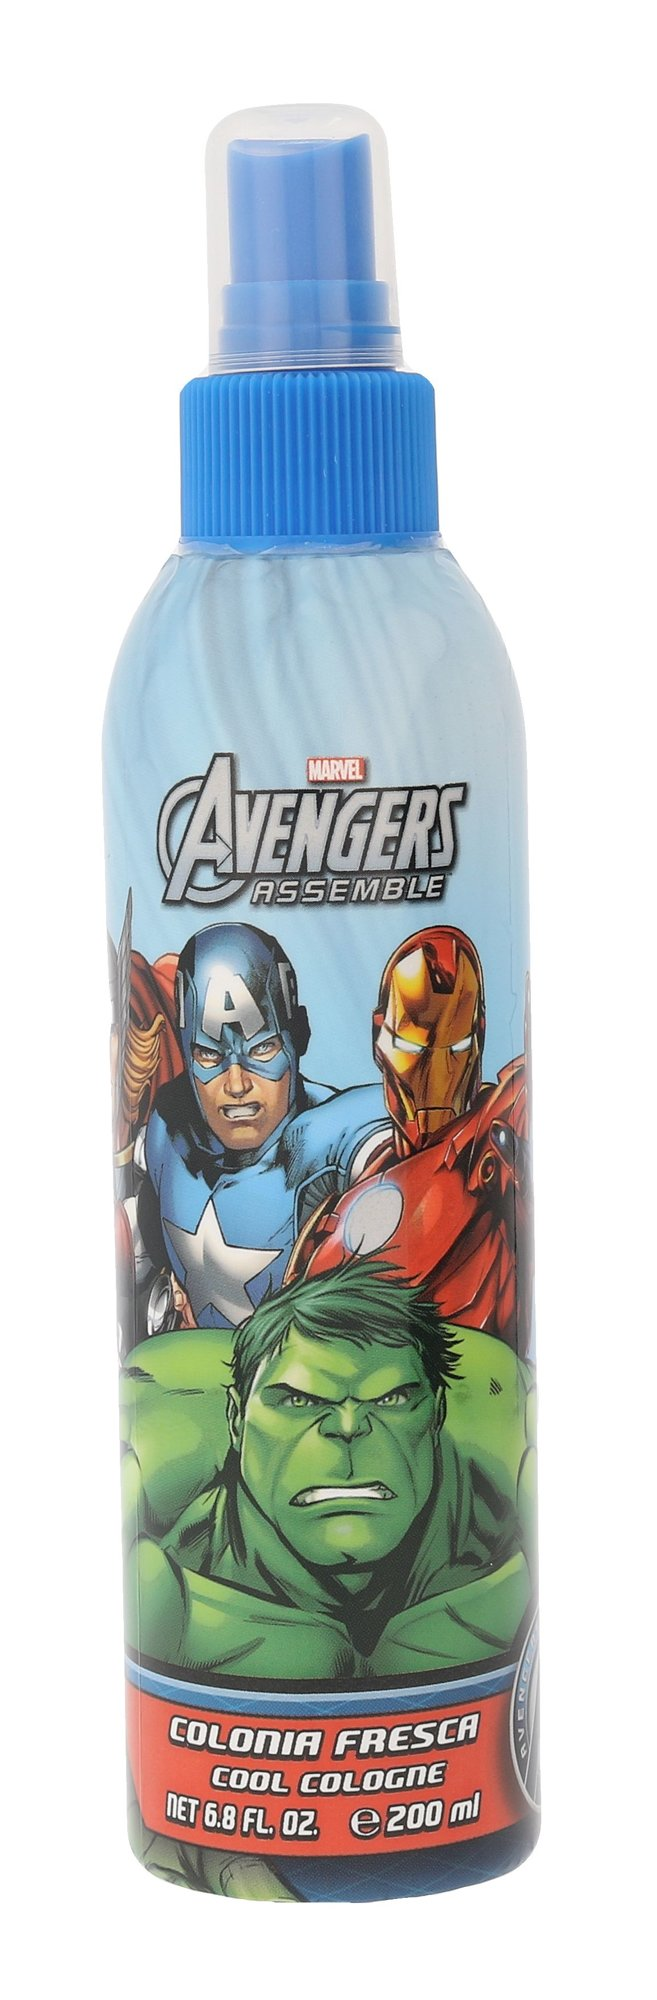 Marvel Avengers Assemble Tělový spray 200ml